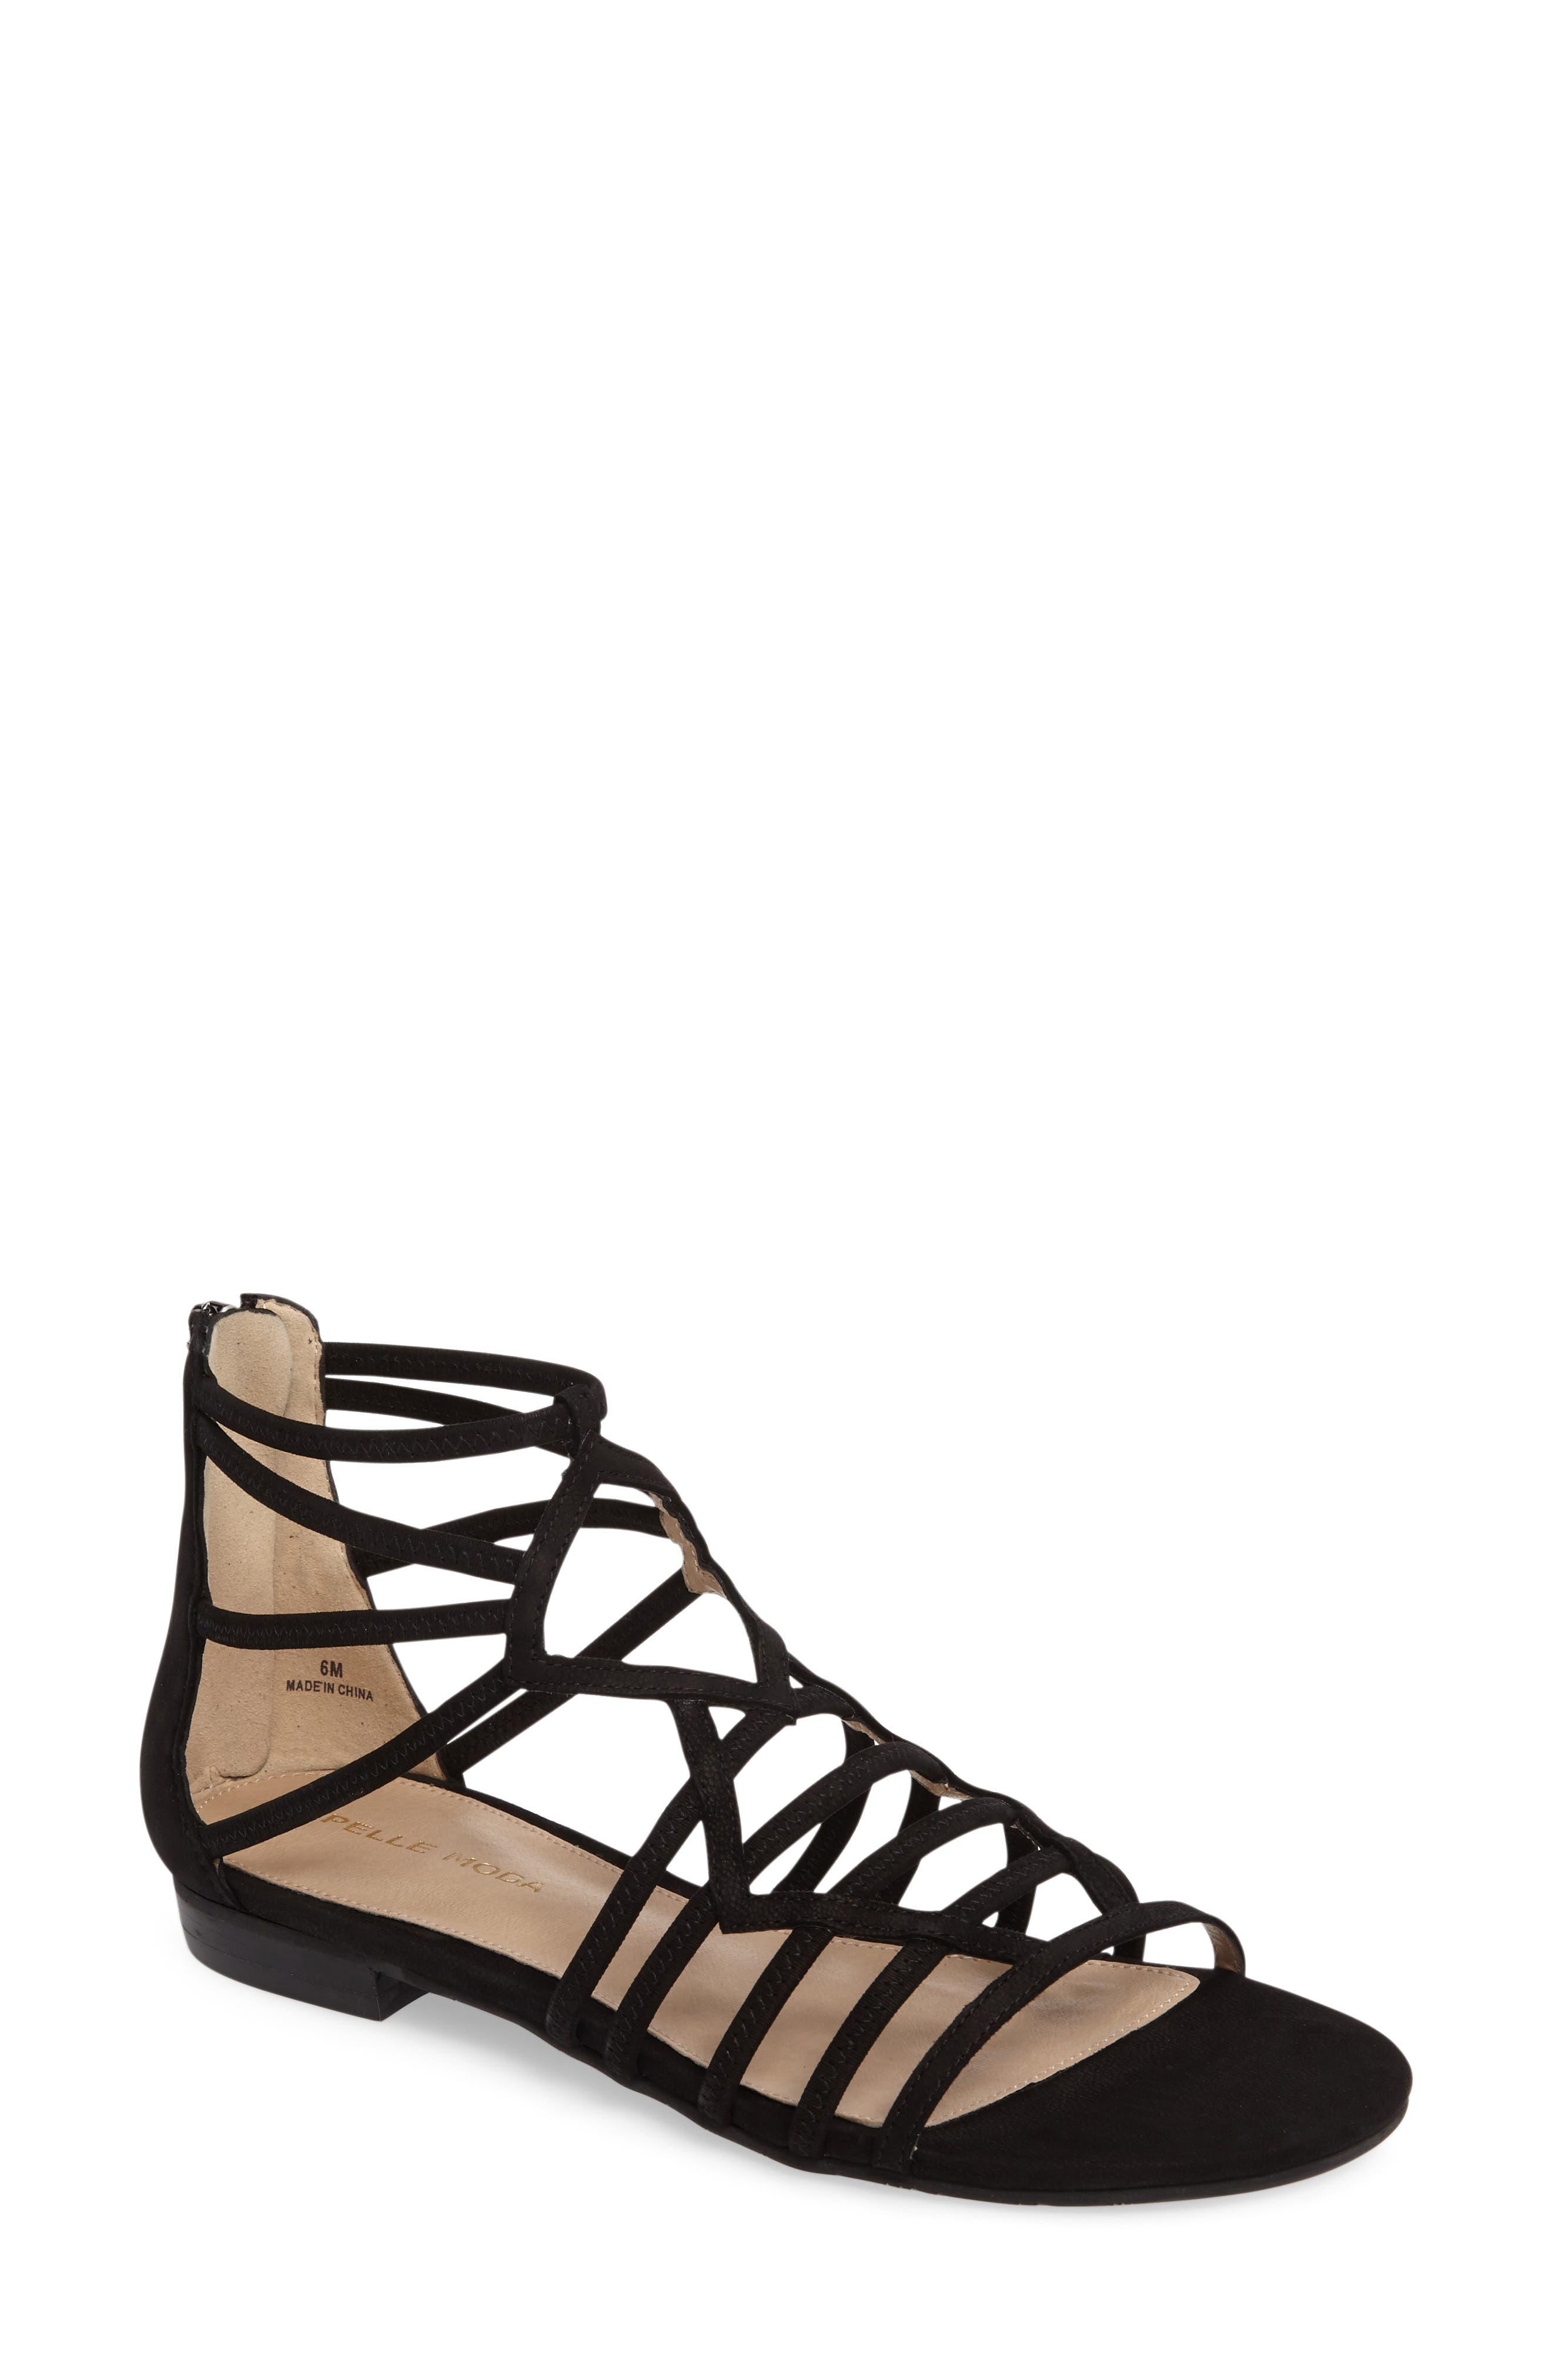 Main Image - Pelle Moda Brazil Strappy Sandal (Women)